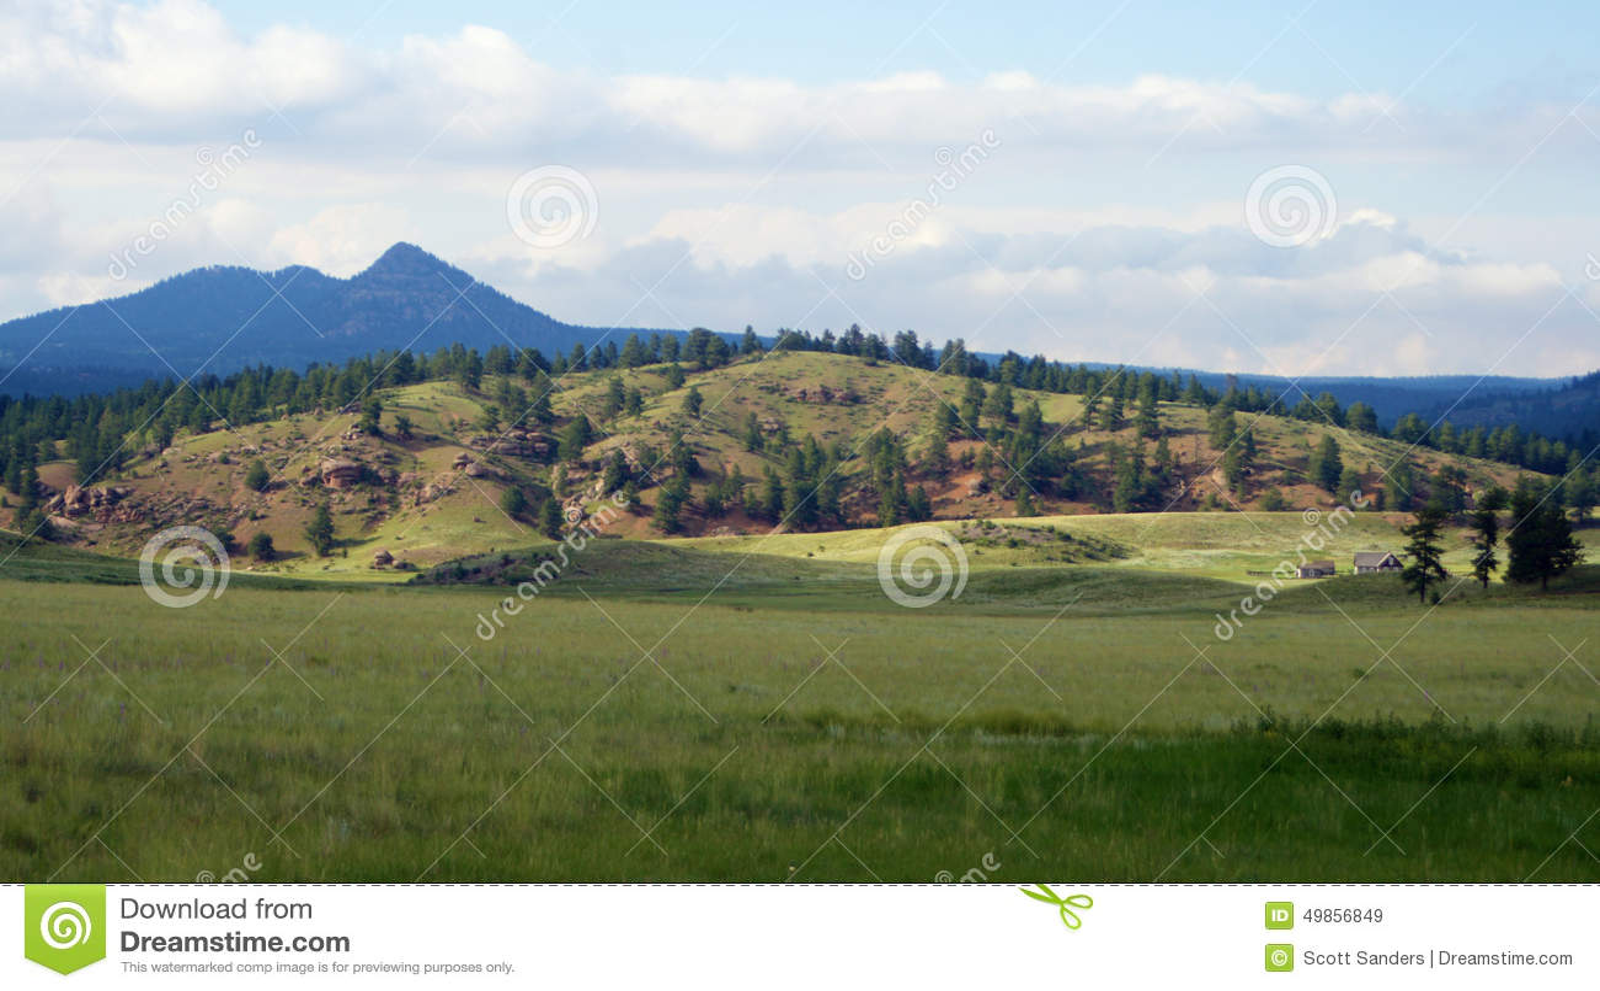 Colorado Landscape Stock Photo - Image: 49856849